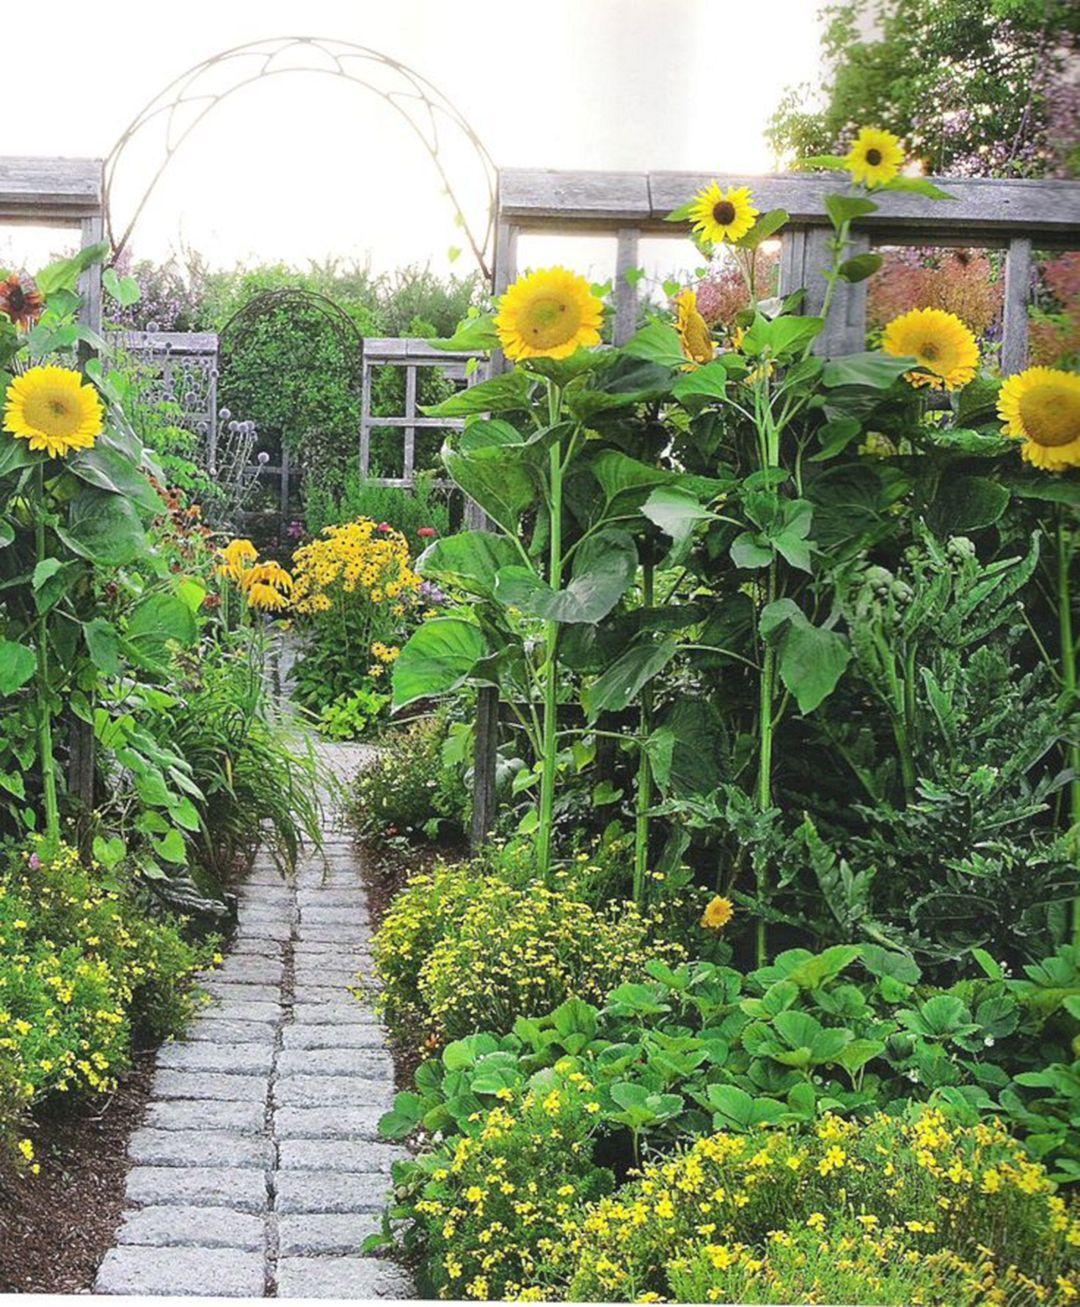 57 Amazing Beautiful Garden Ideas Inspiration And: Impressive 25 Beautiful Sunflower Backyard Design For Your